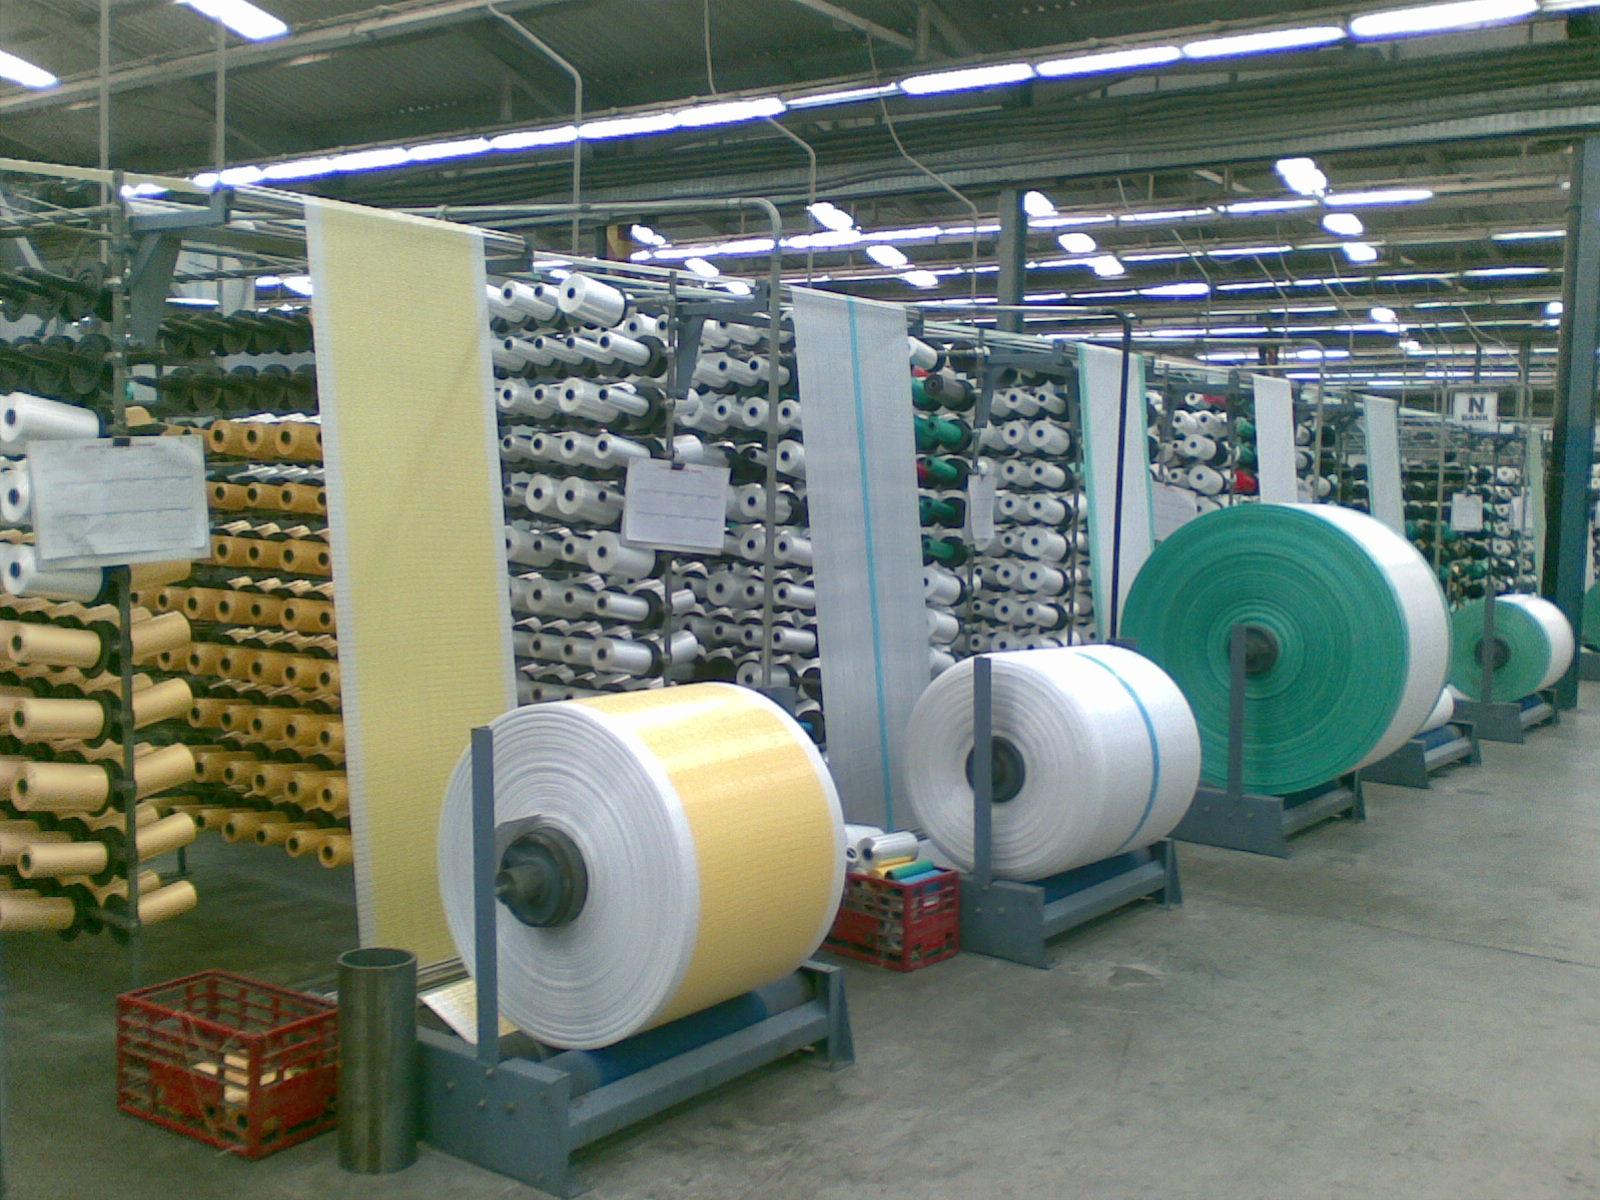 Manufacturing-Nigeria-TVCNews22